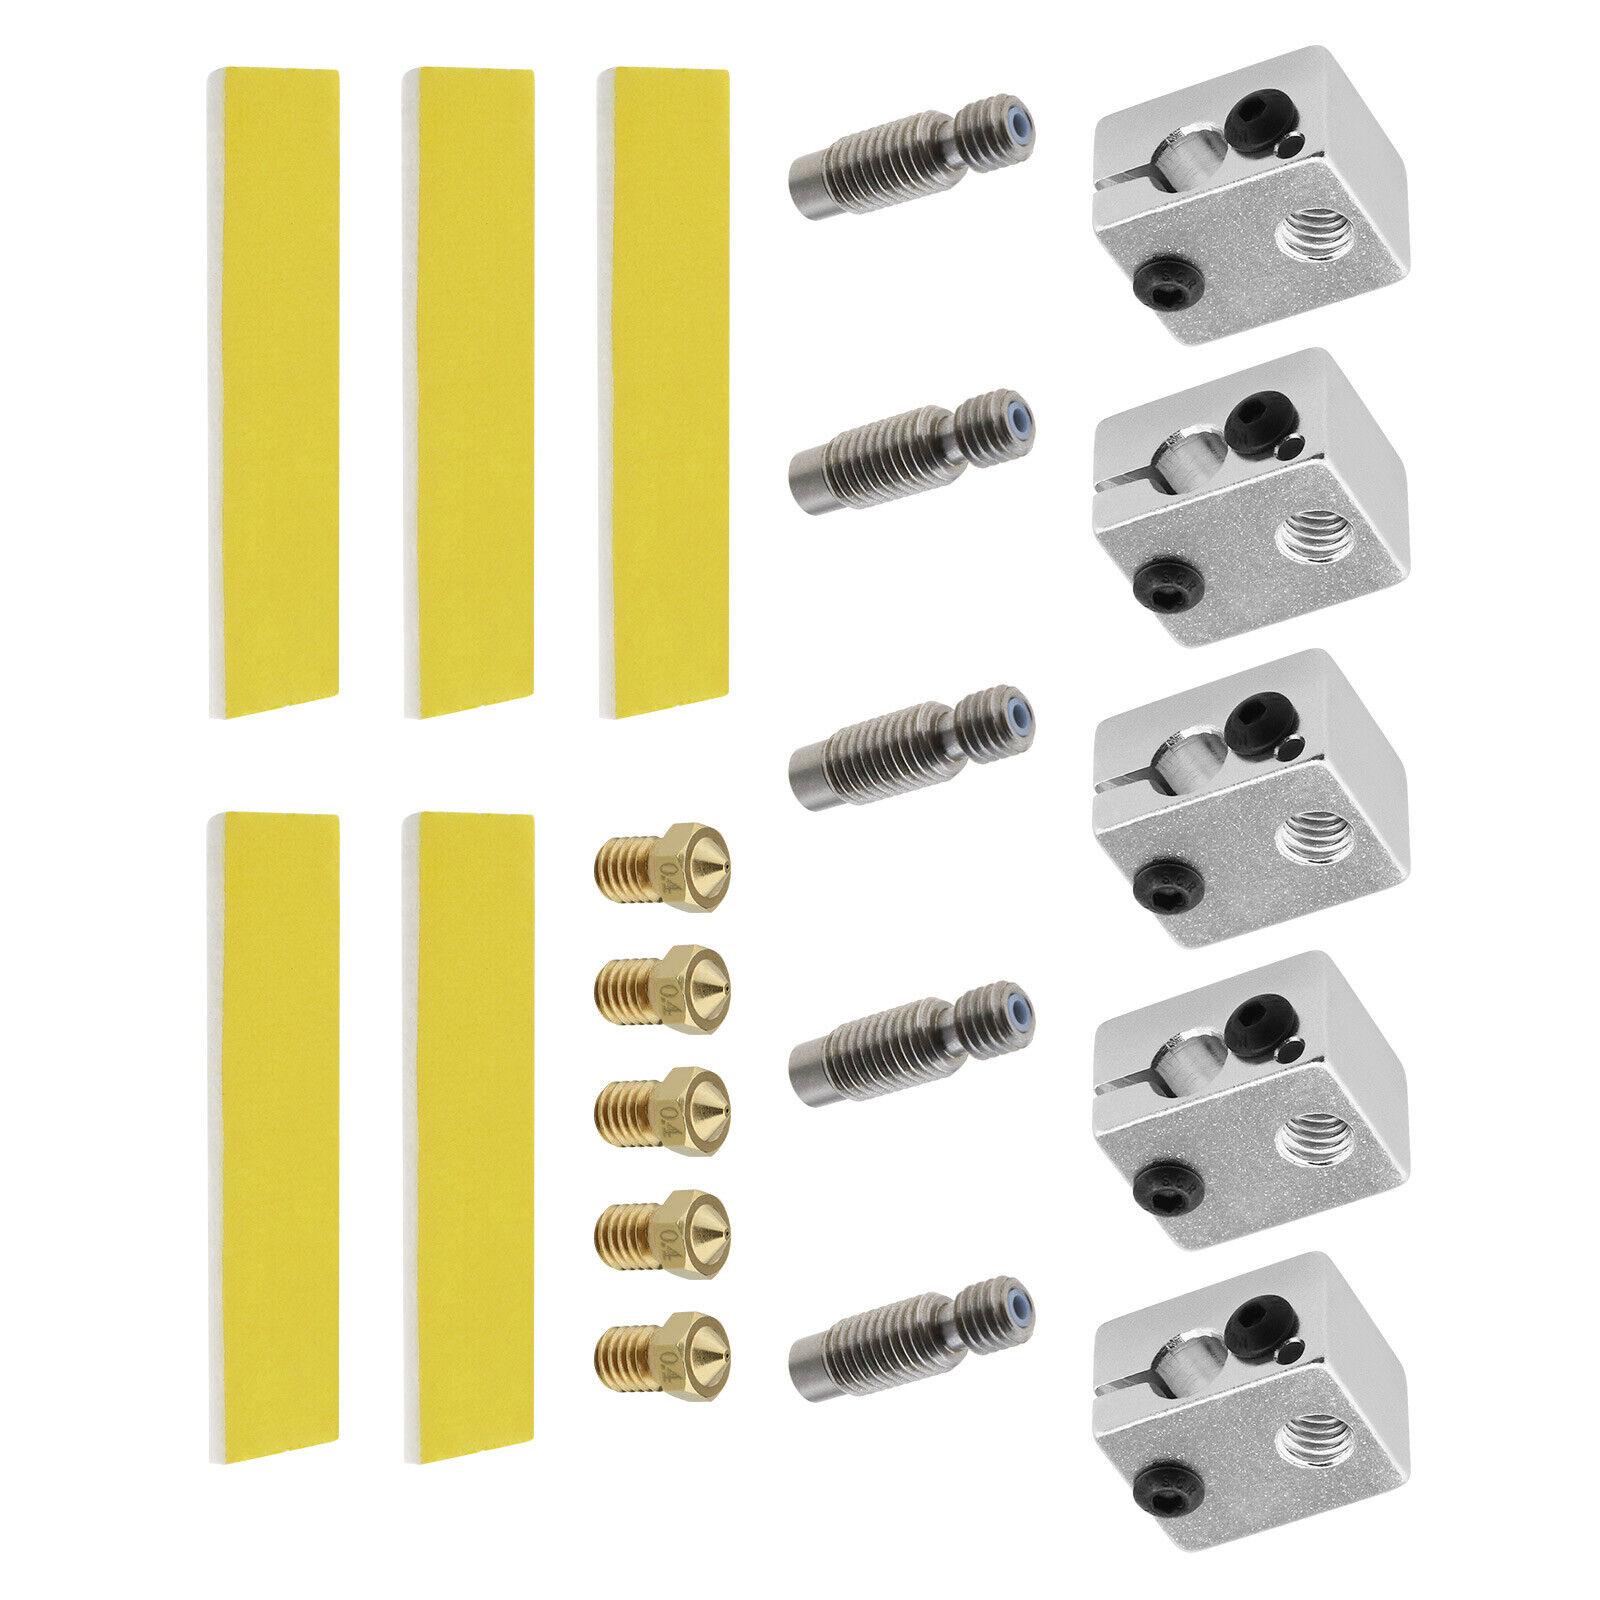 5 Sets 3D Printer Extruder 1.75mm Throat Tube Heater Block 0.4mm Brass Nozzles